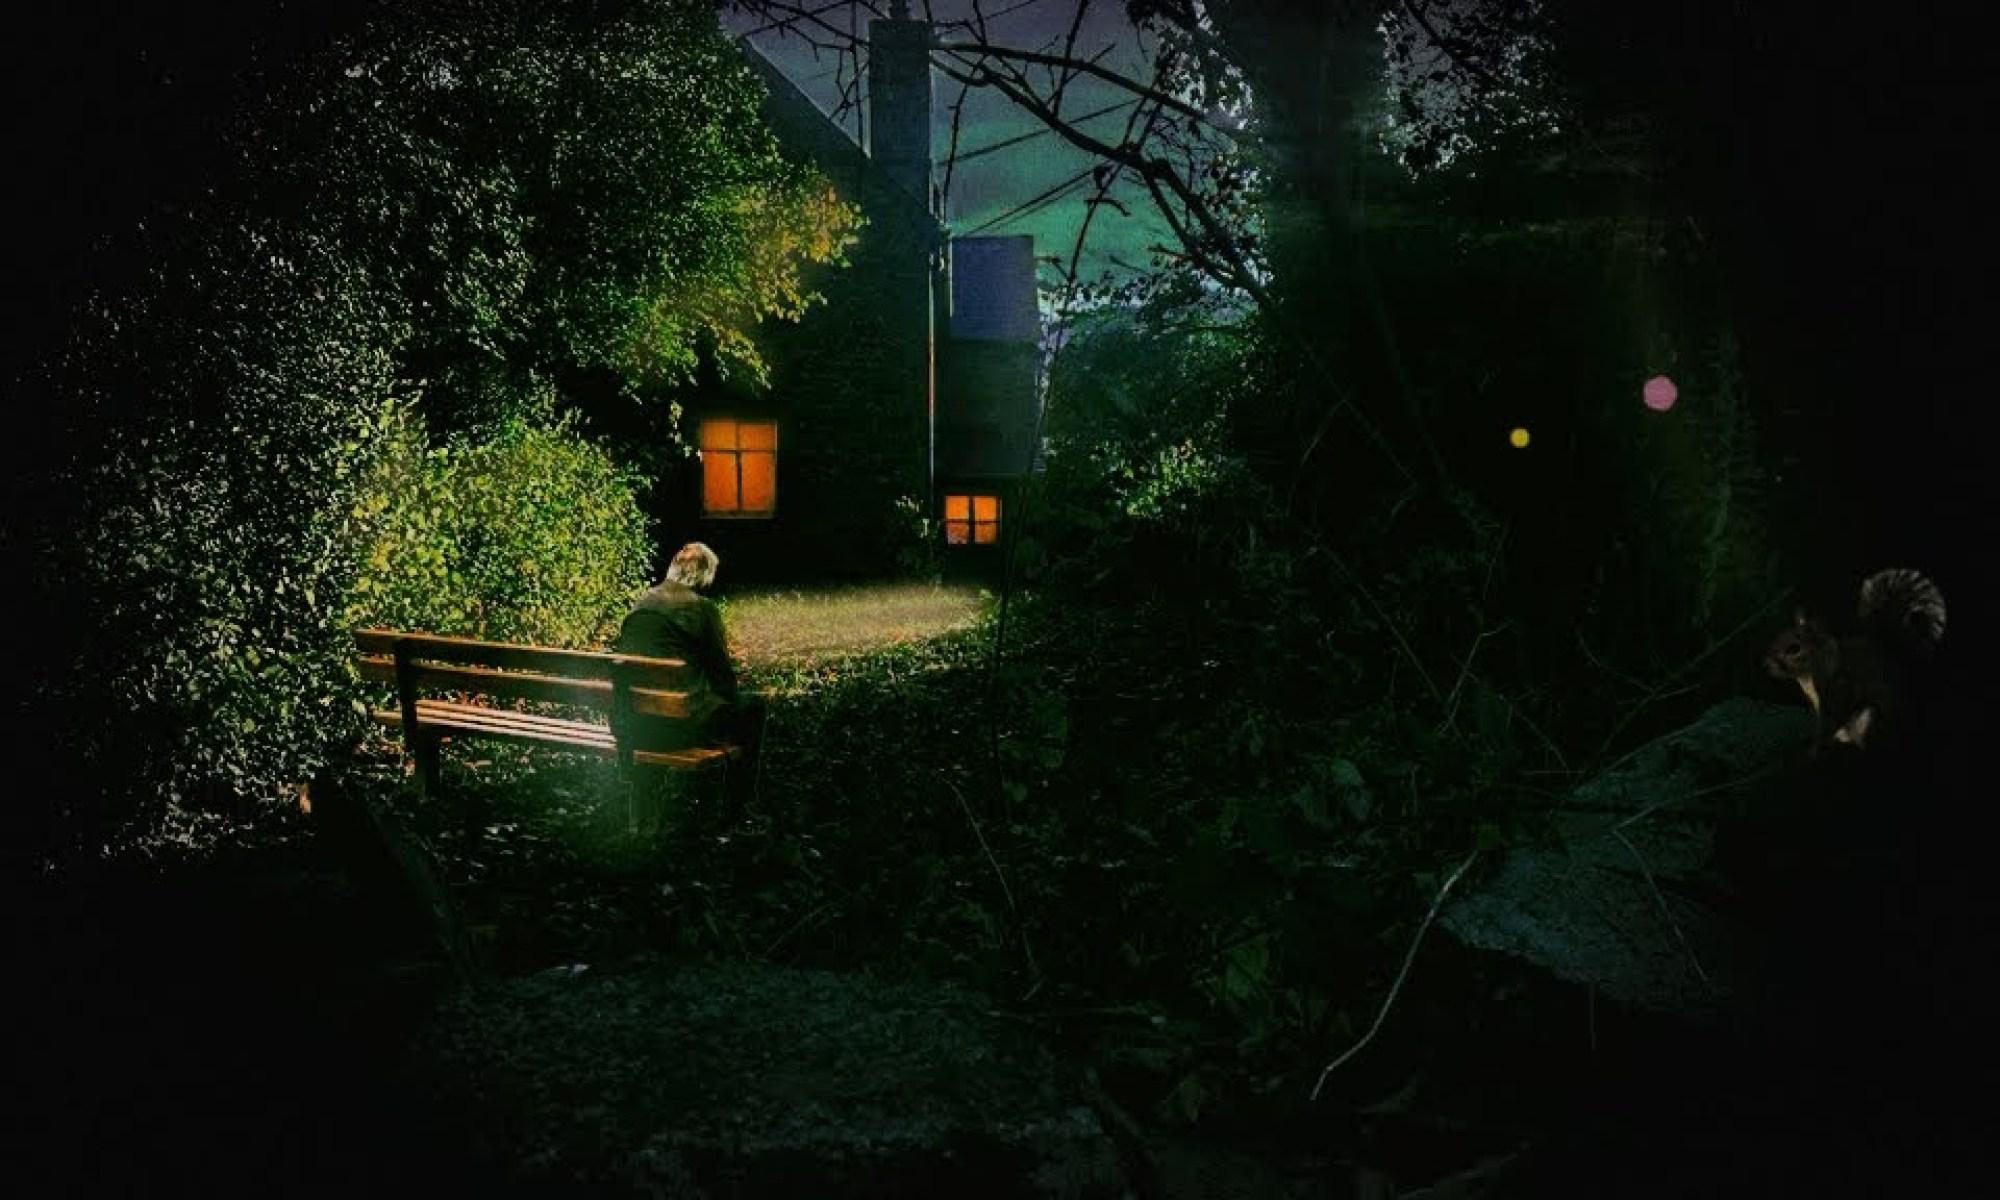 Basking In The Evening Light